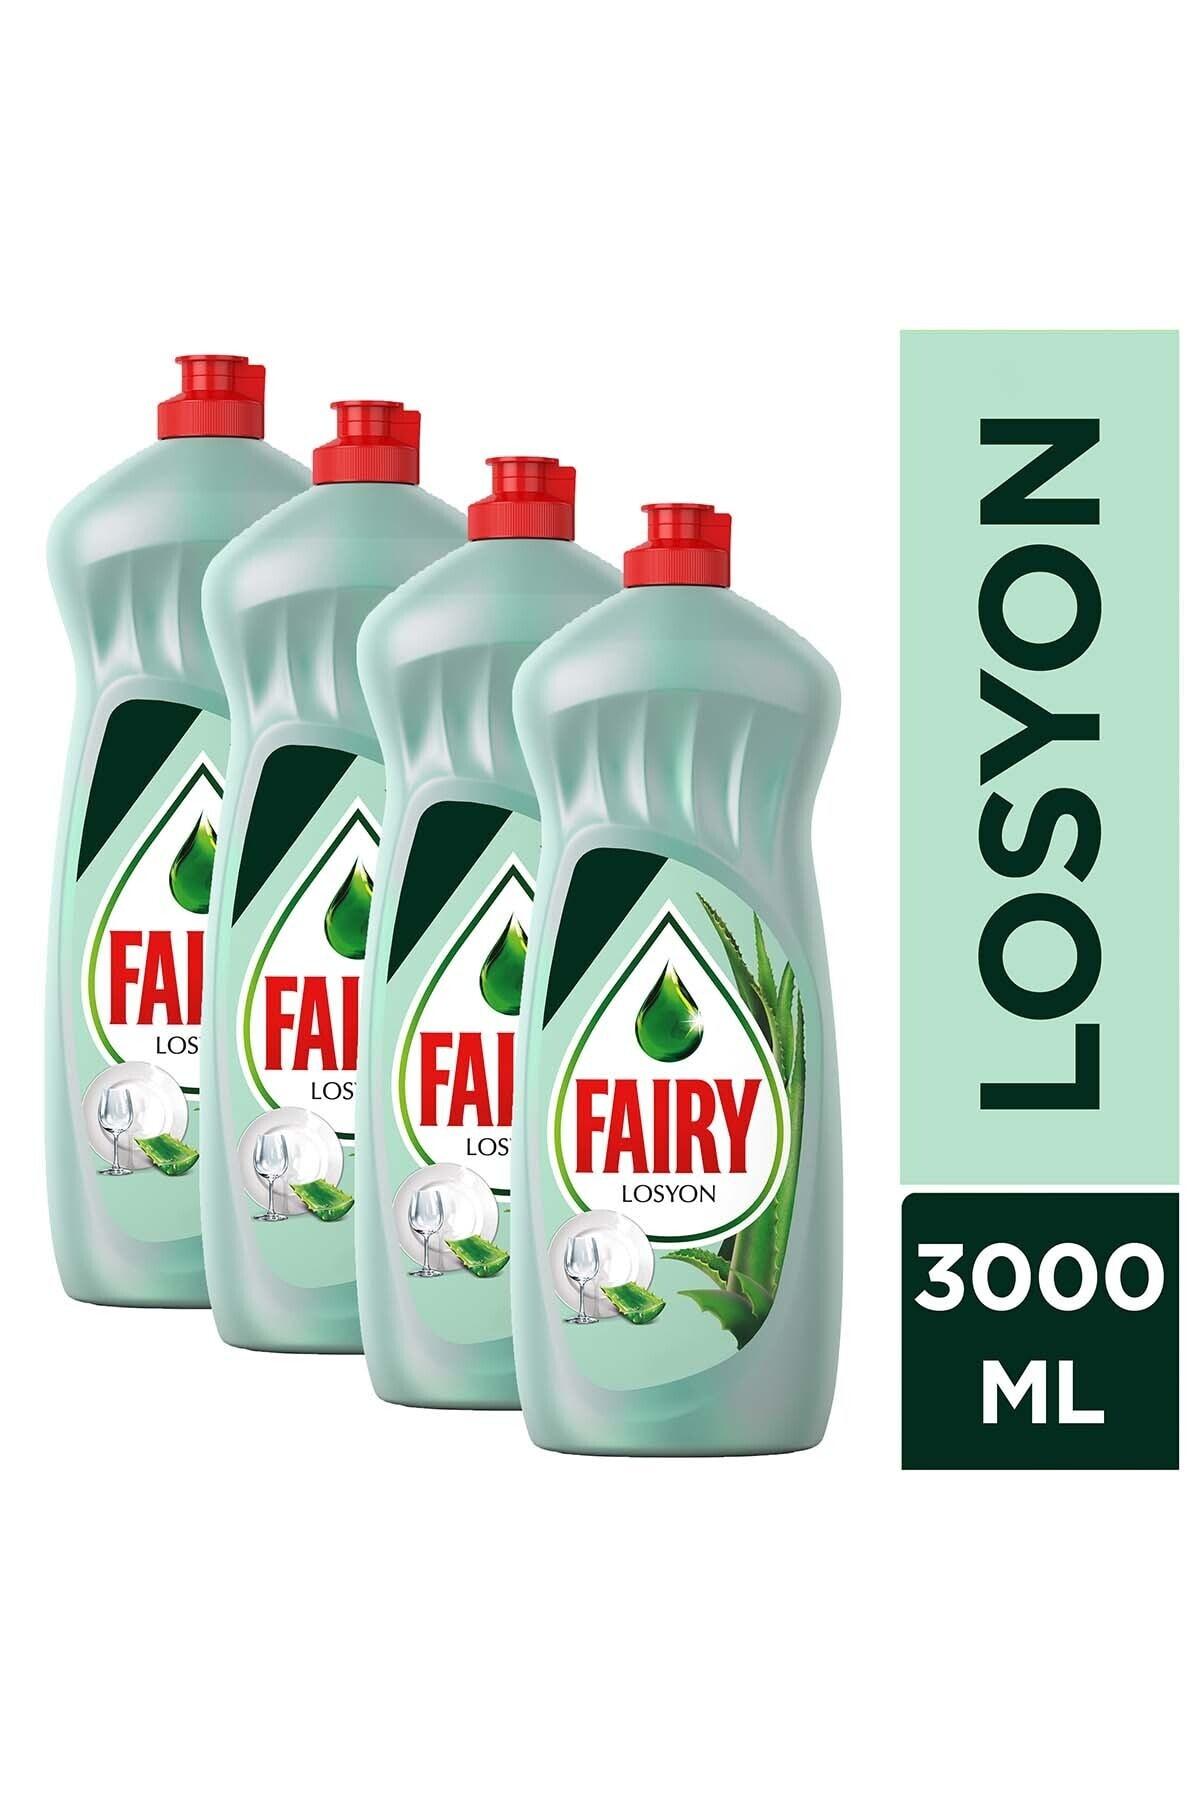 Fairy Losyon 750 Ml X 4 1